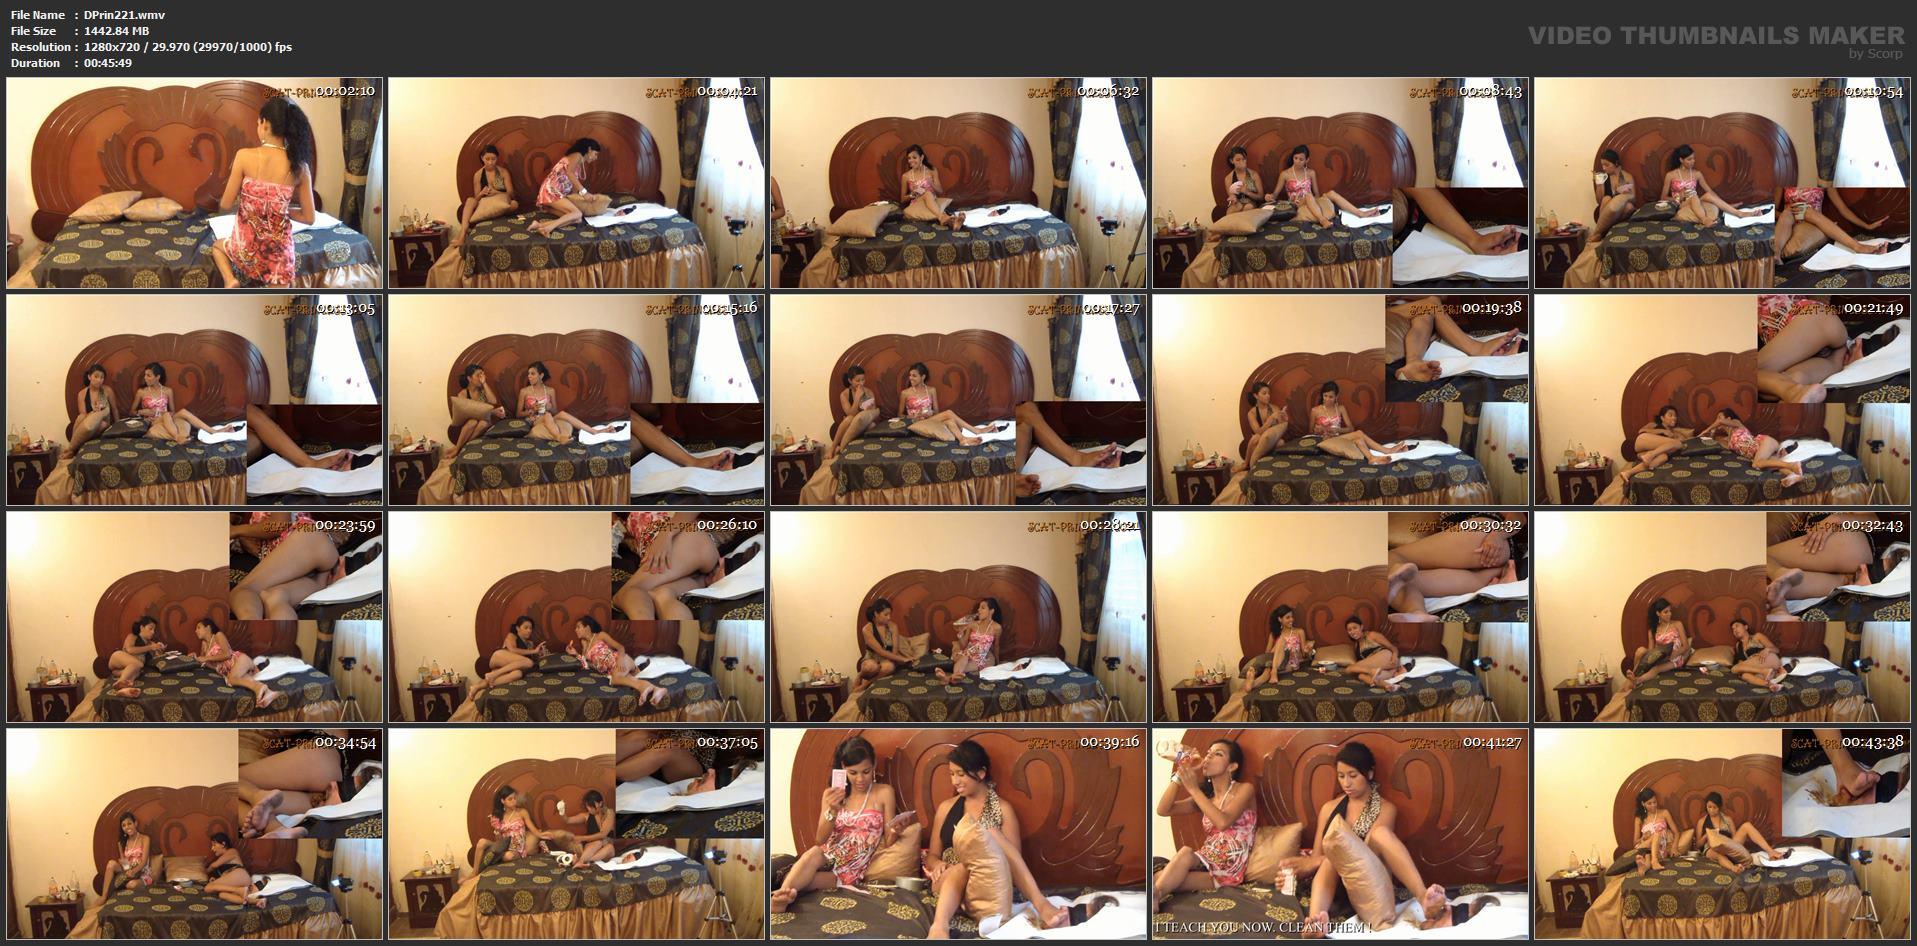 [DOM-PRINCESS] Toilet Slave's Bed Cage Part 5 Nataly [HD][720p][WMV]